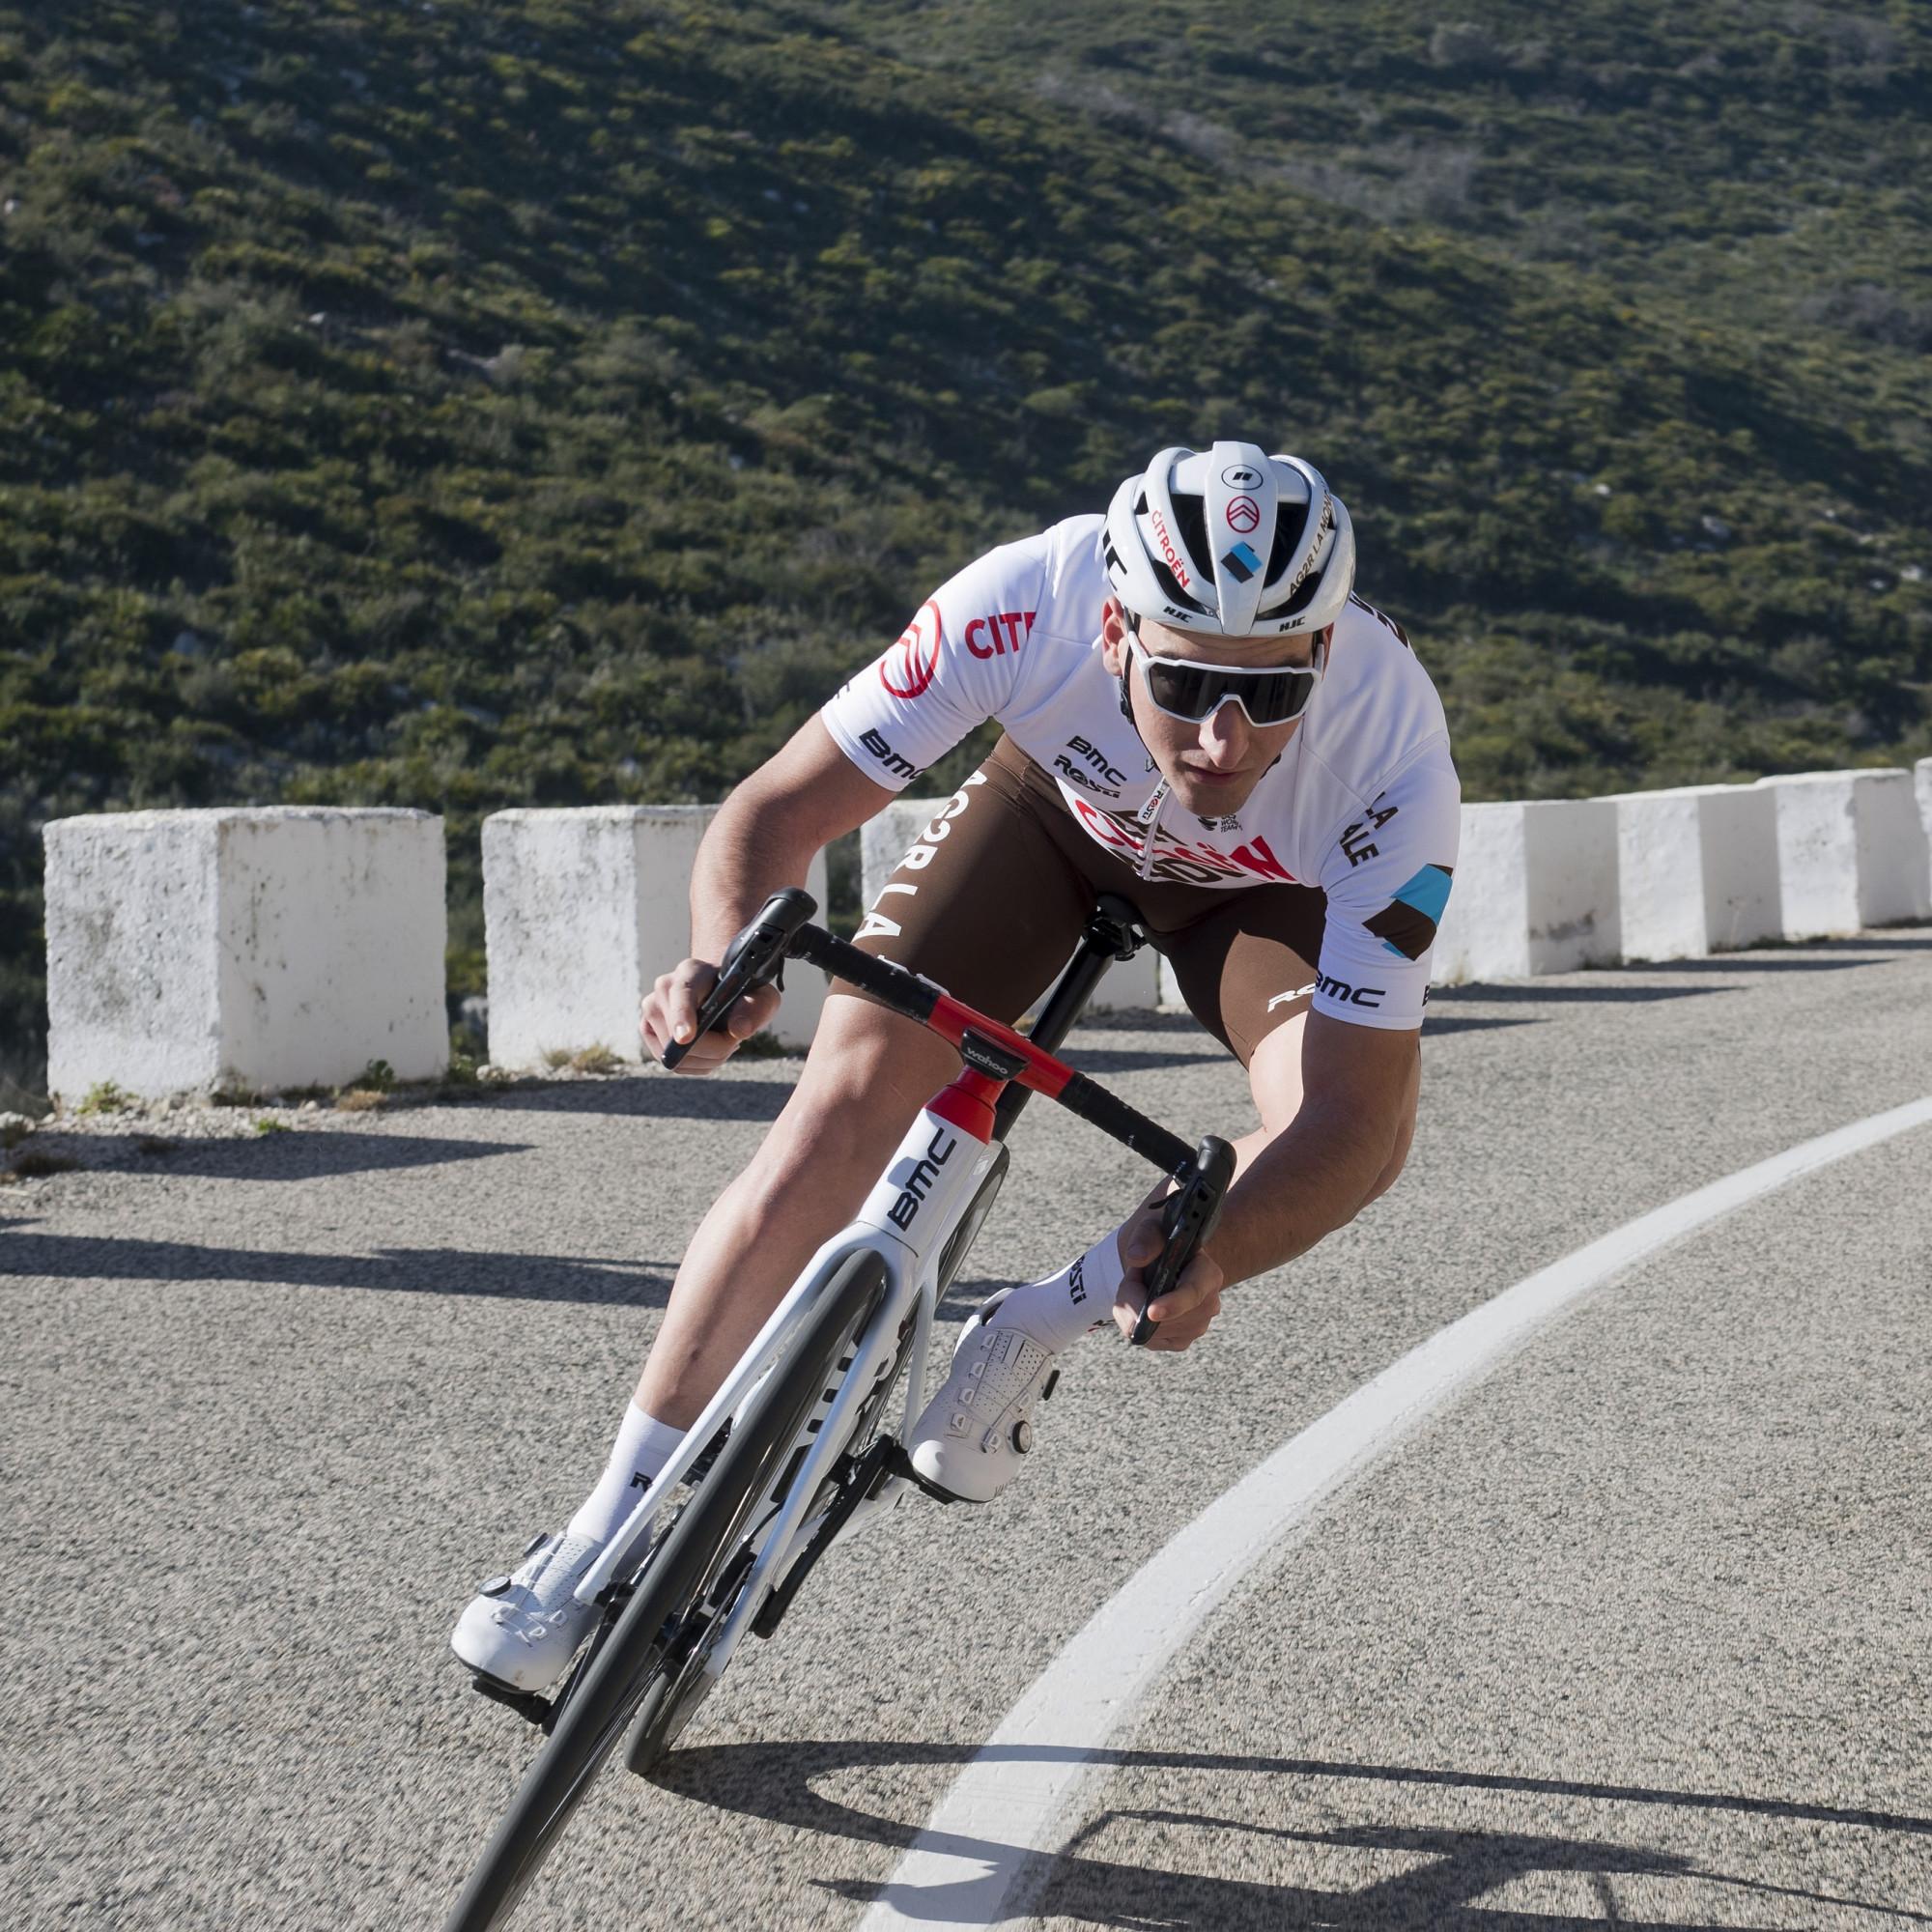 Nans Peters | Tirreno-Adriatico | Stage 6